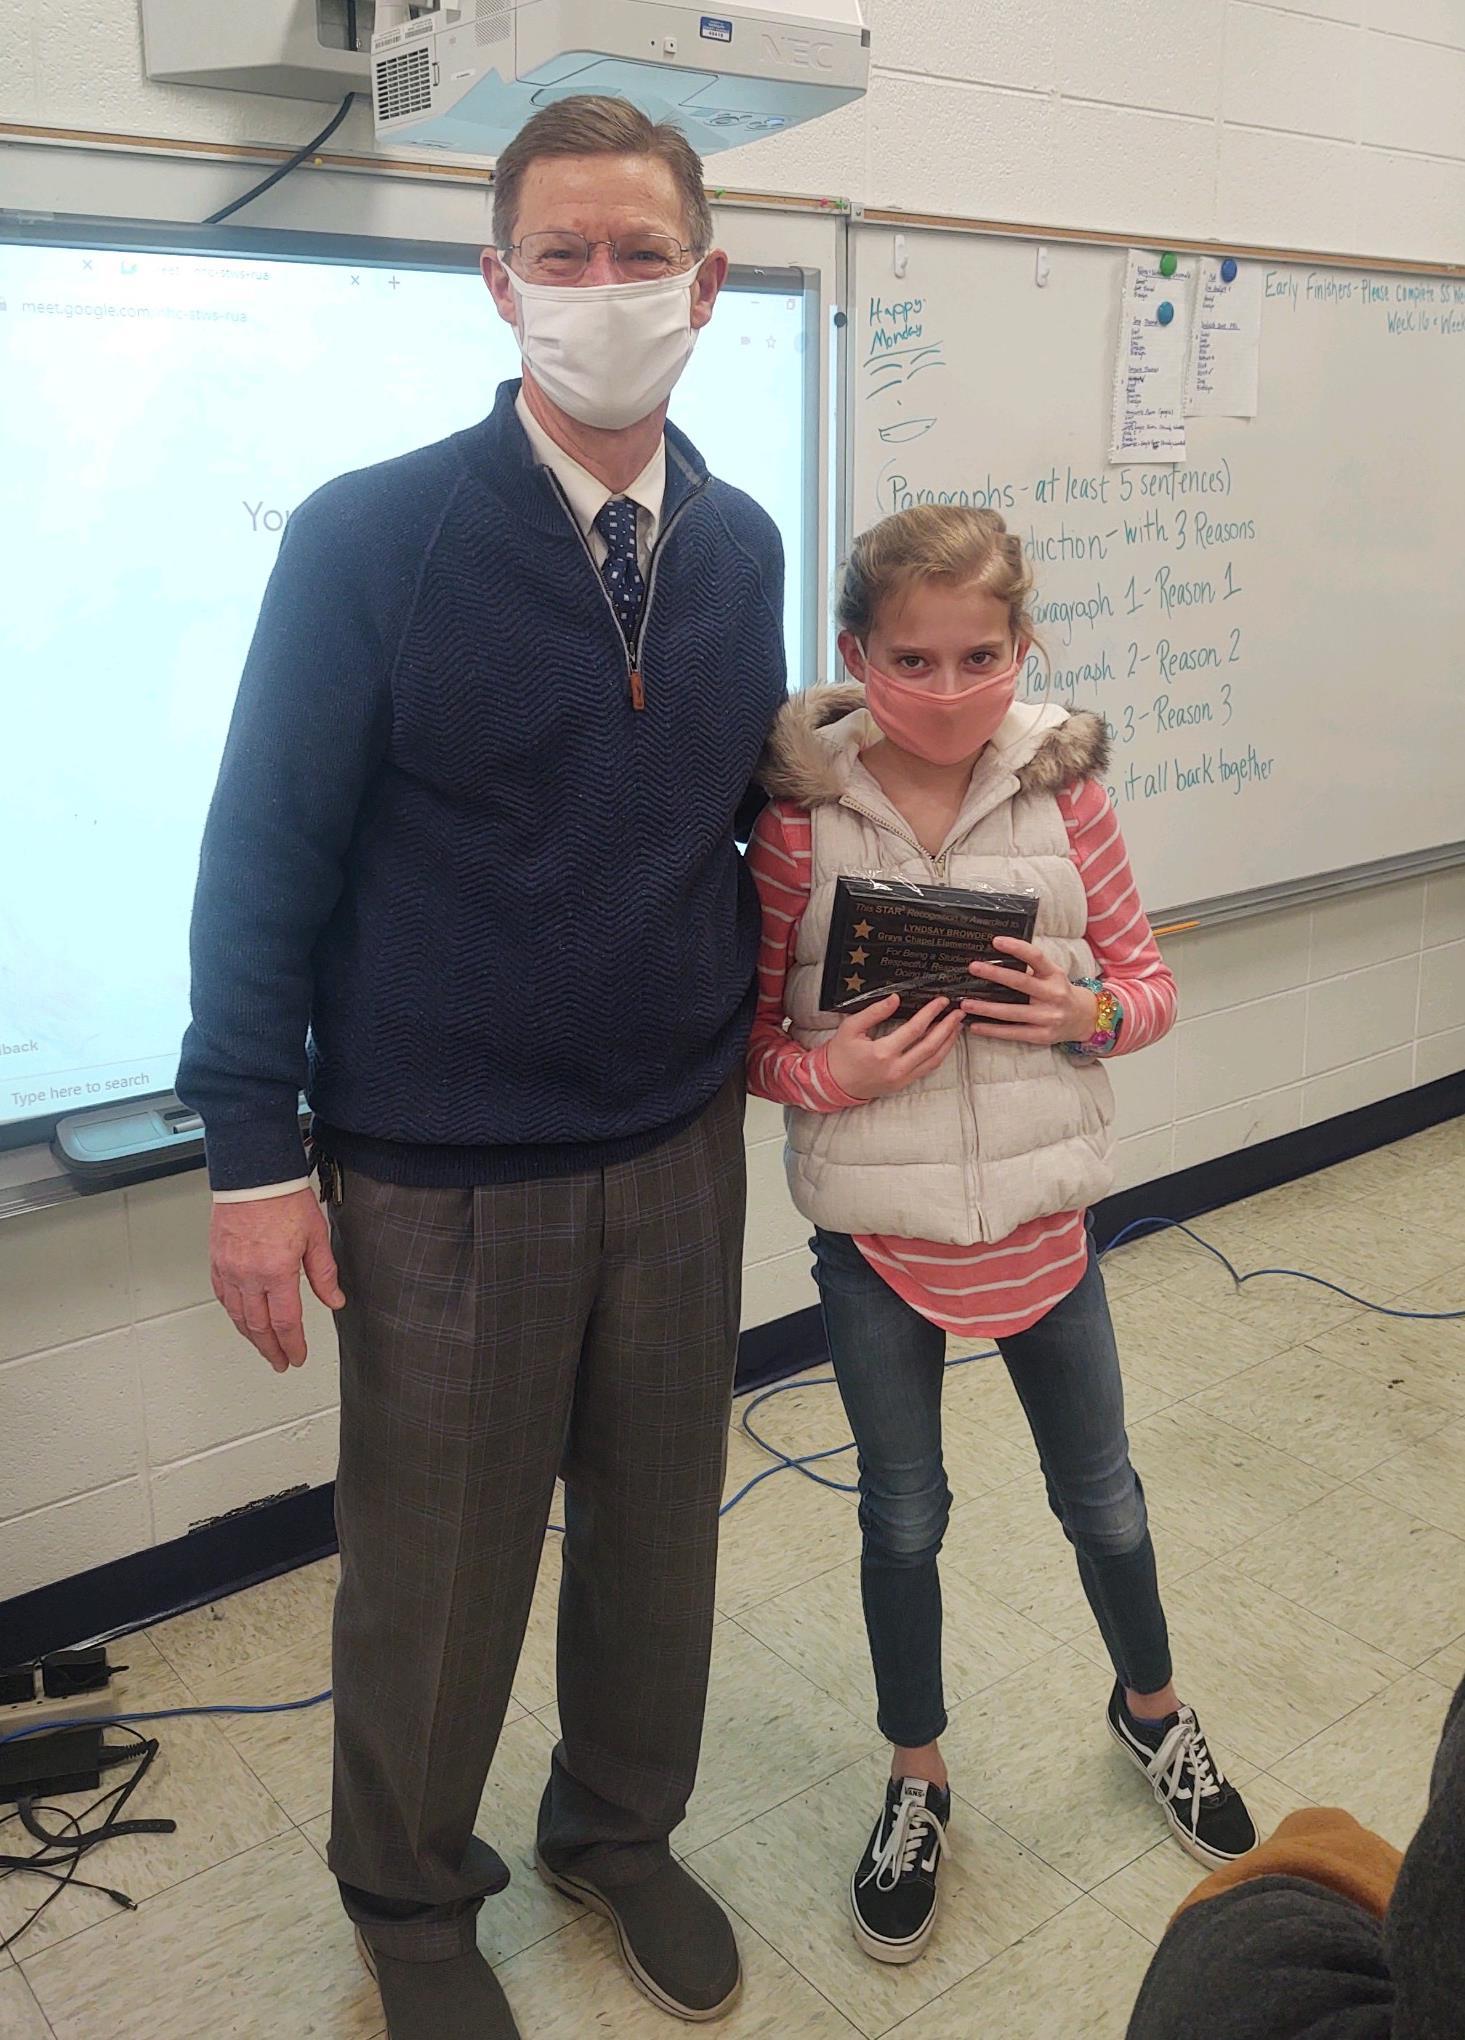 Lyndsay Browder and Mr. Reaves